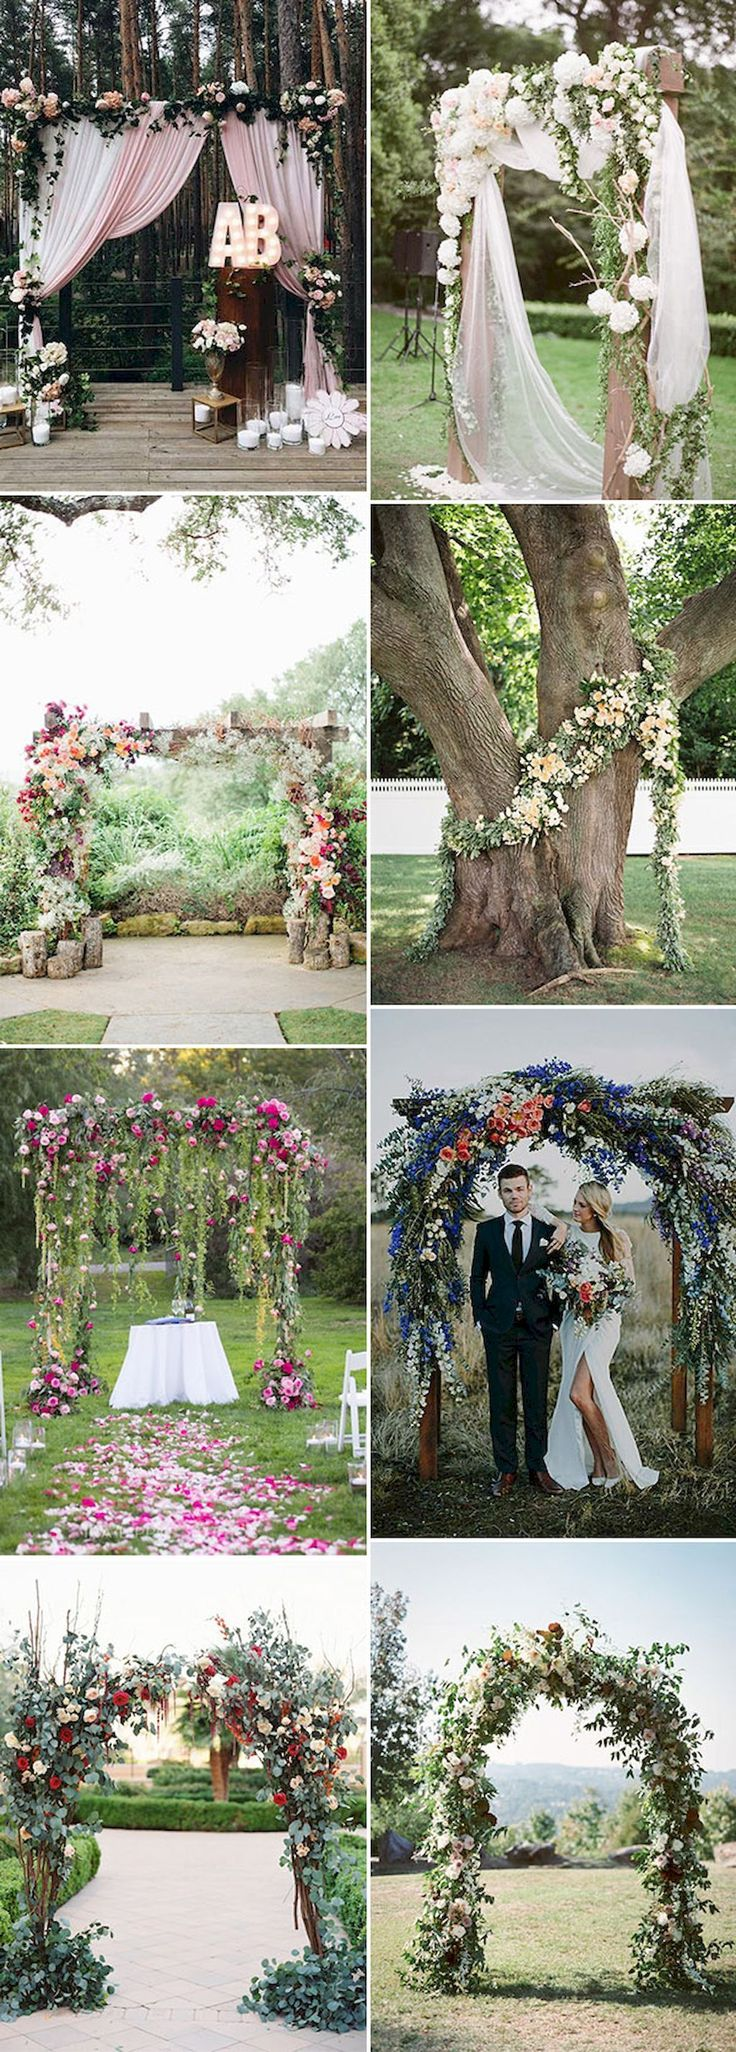 Awesome 48 Elegant Outdoor Wedding Decor Ideas on A Budget  https://bitecloth.